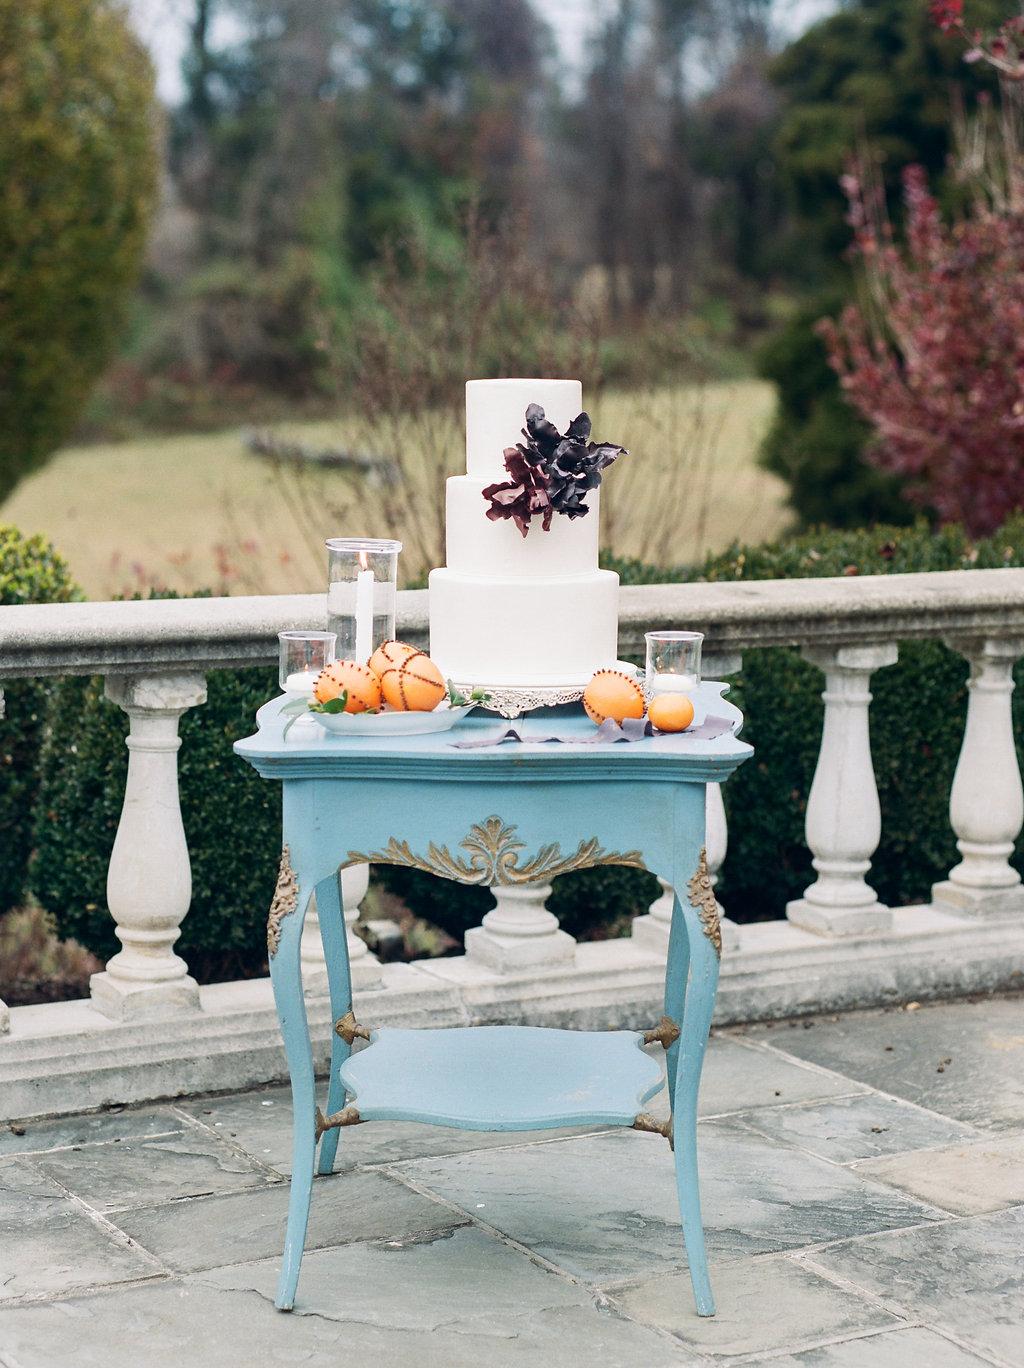 wedding cake tables - photo by Lissa Ryan Photography http://ruffledblog.com/modern-romantic-wedding-ideas-with-family-heirlooms